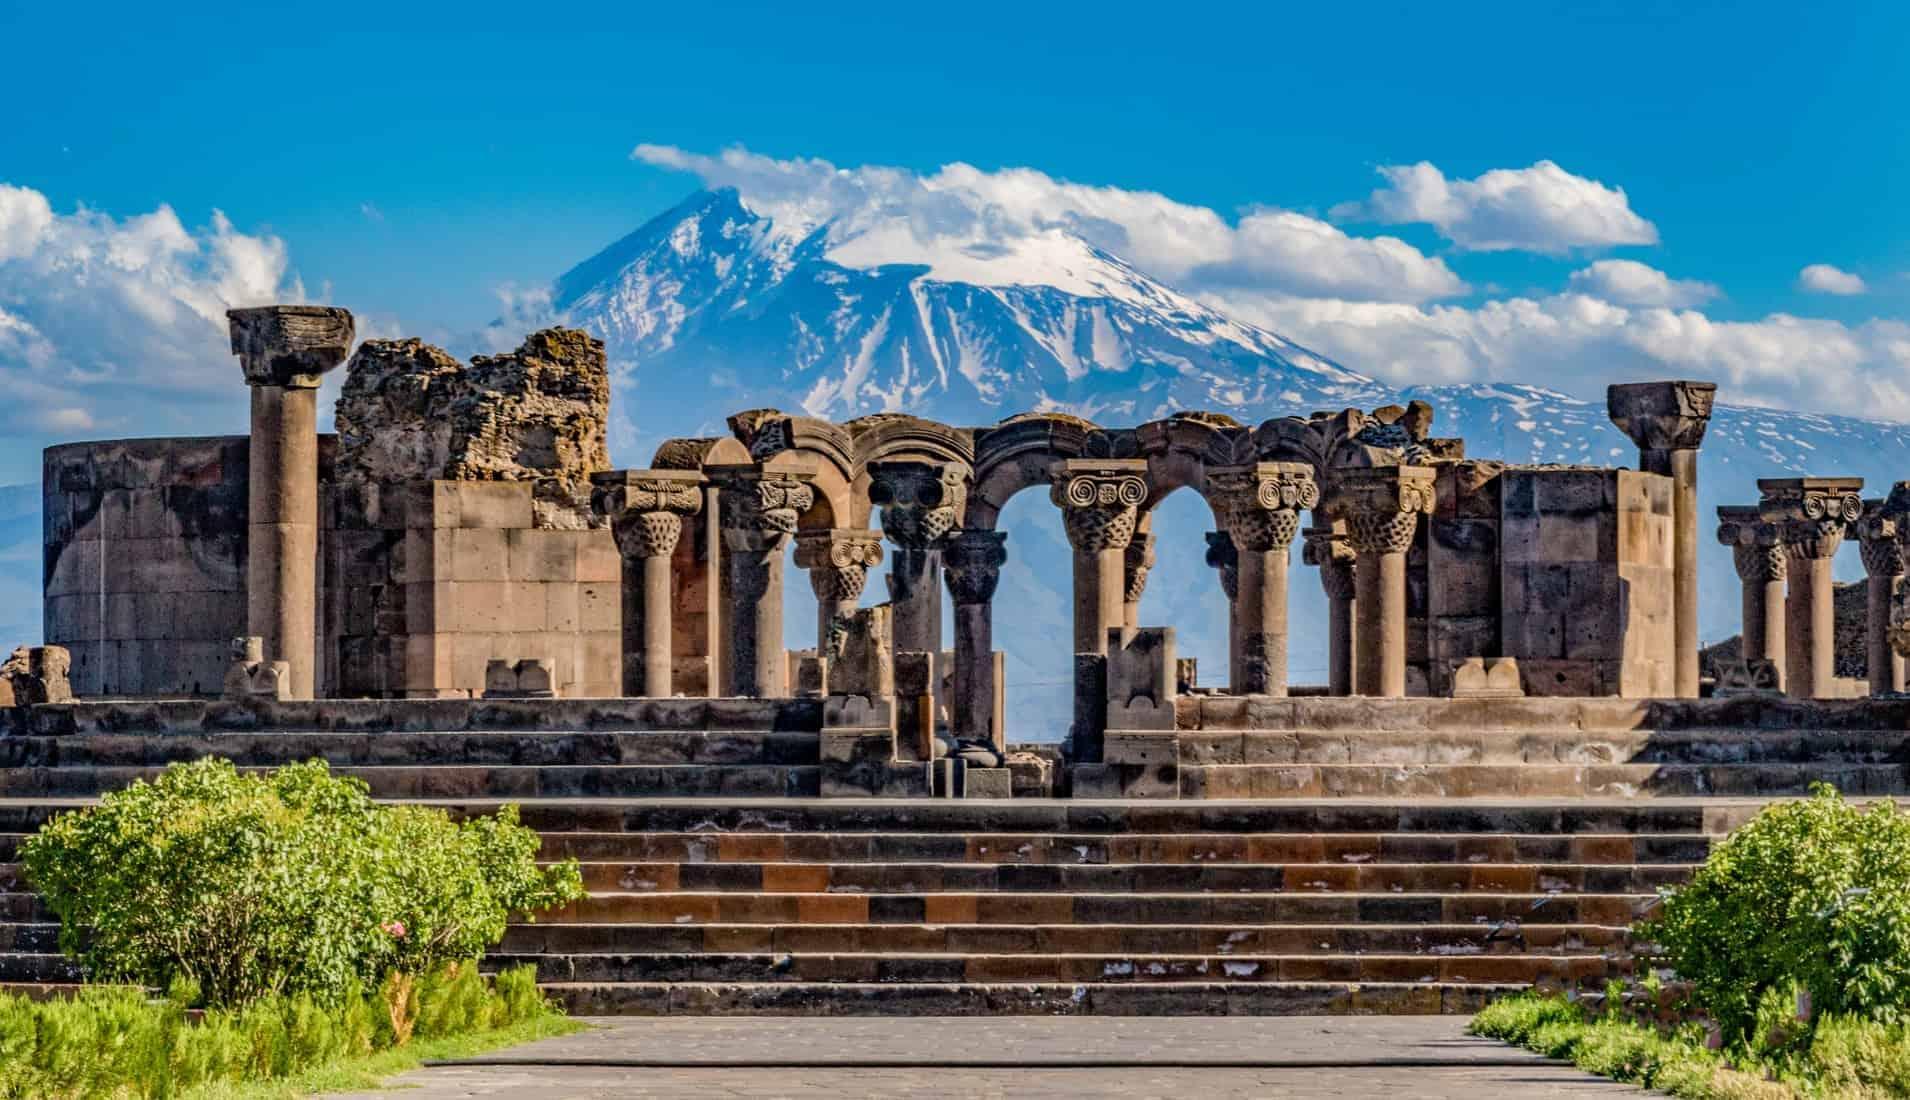 Travel highlights in Armenia. Ruins of the Zvartnos temple in Yerevan, Armenia